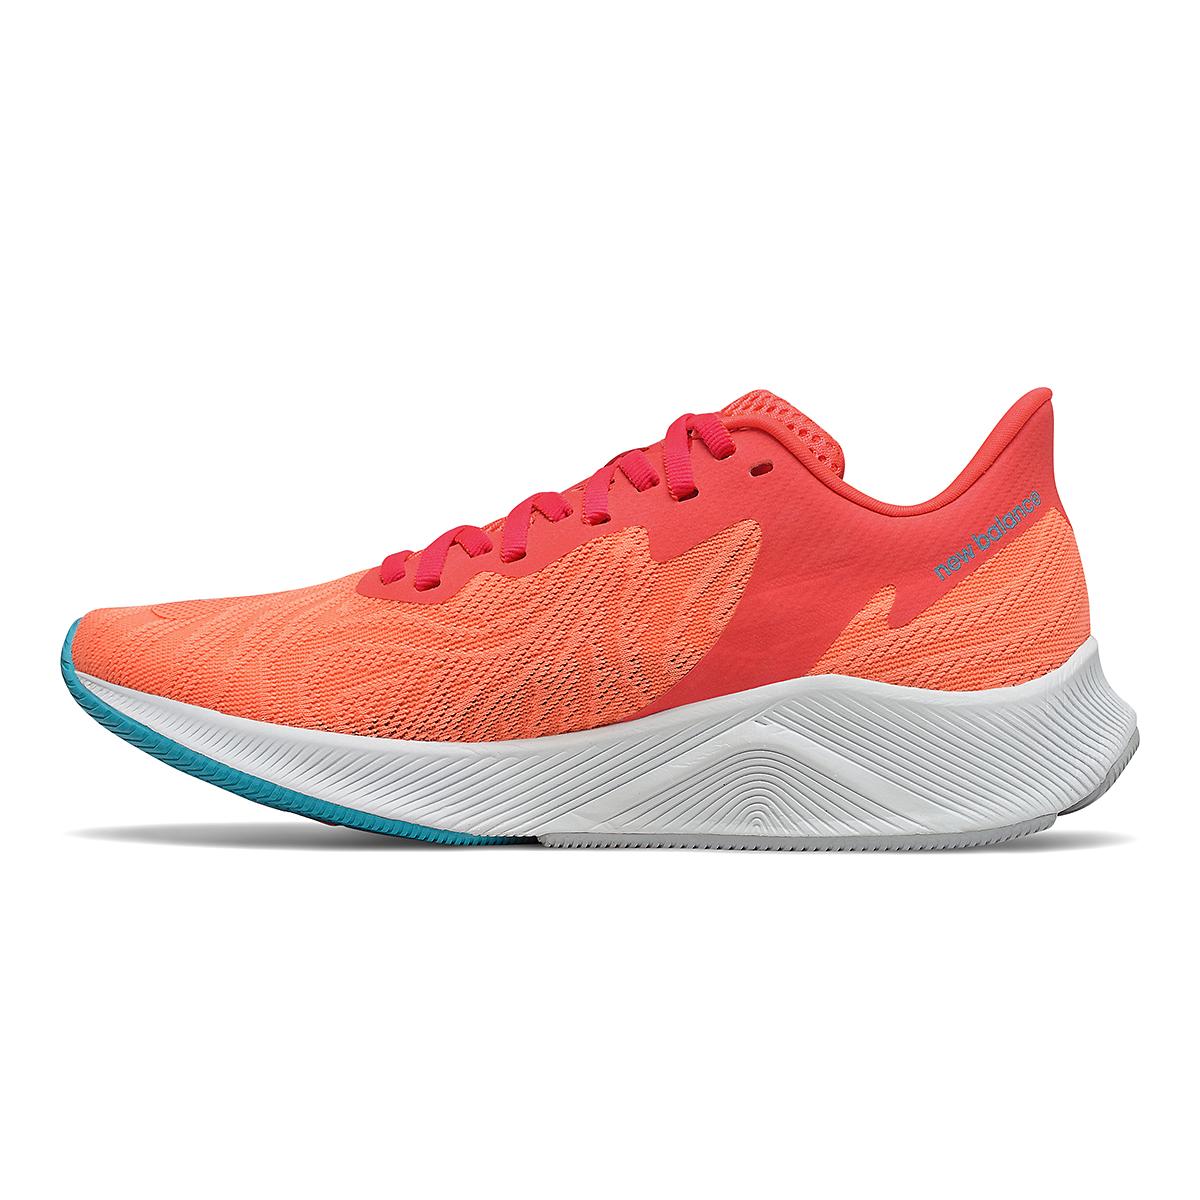 Women's New Balance Fuelcell Prism Running Shoe - Color: Vivid Coral/Citrus - Size: 5 - Width: Regular, Vivid Coral/Citrus, large, image 2